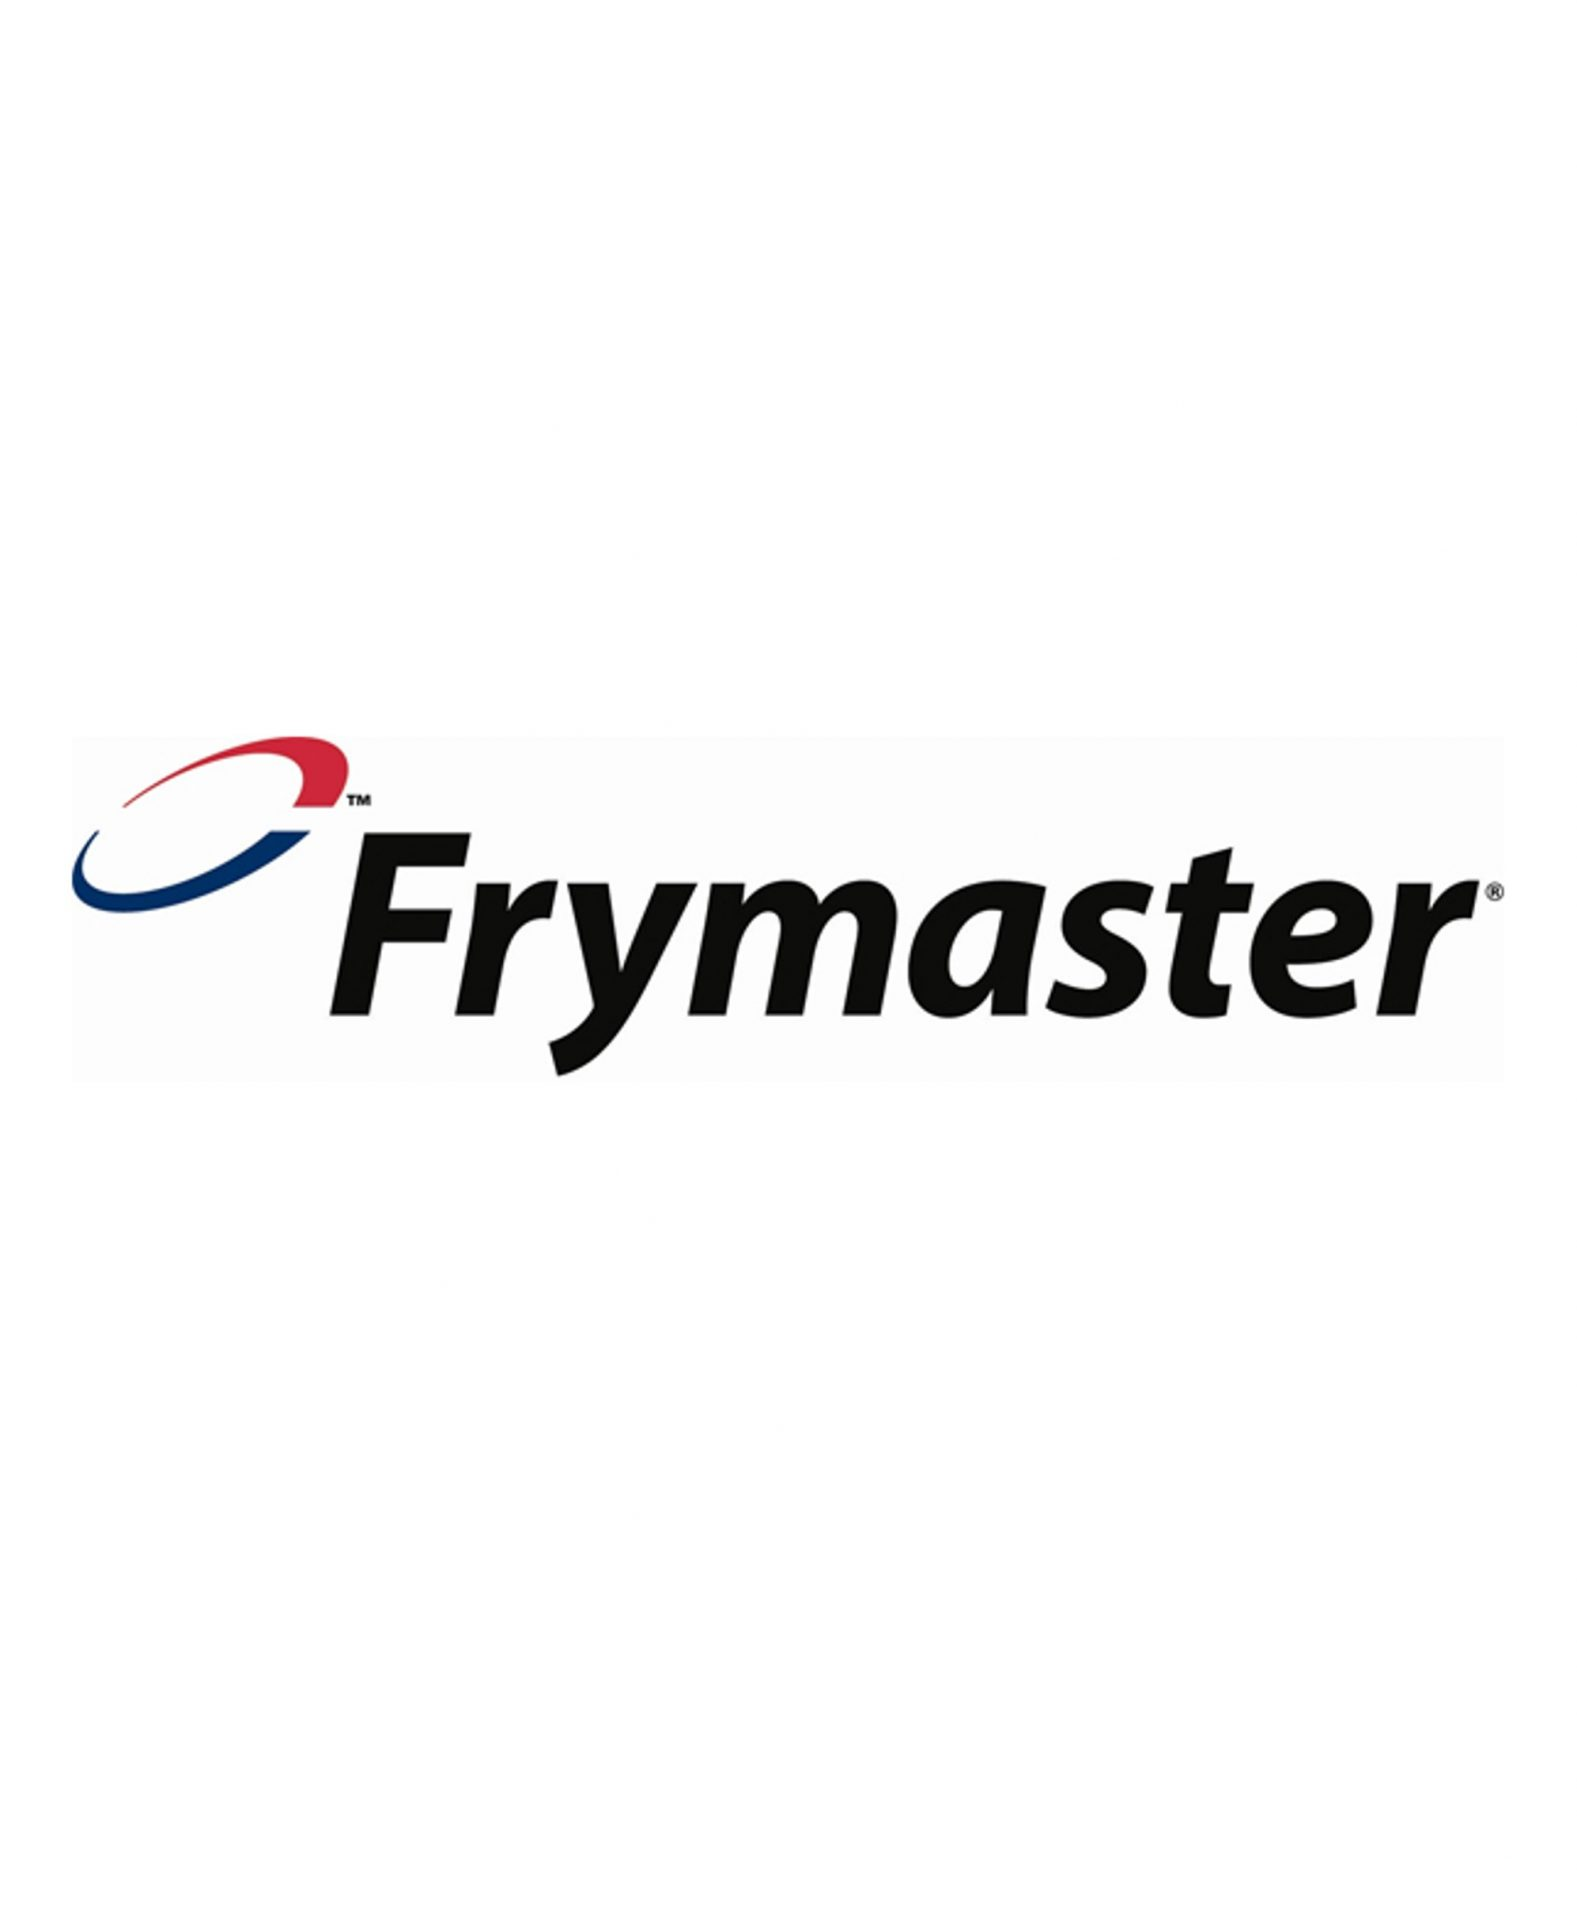 frymaster 1577x1920 - Inicio